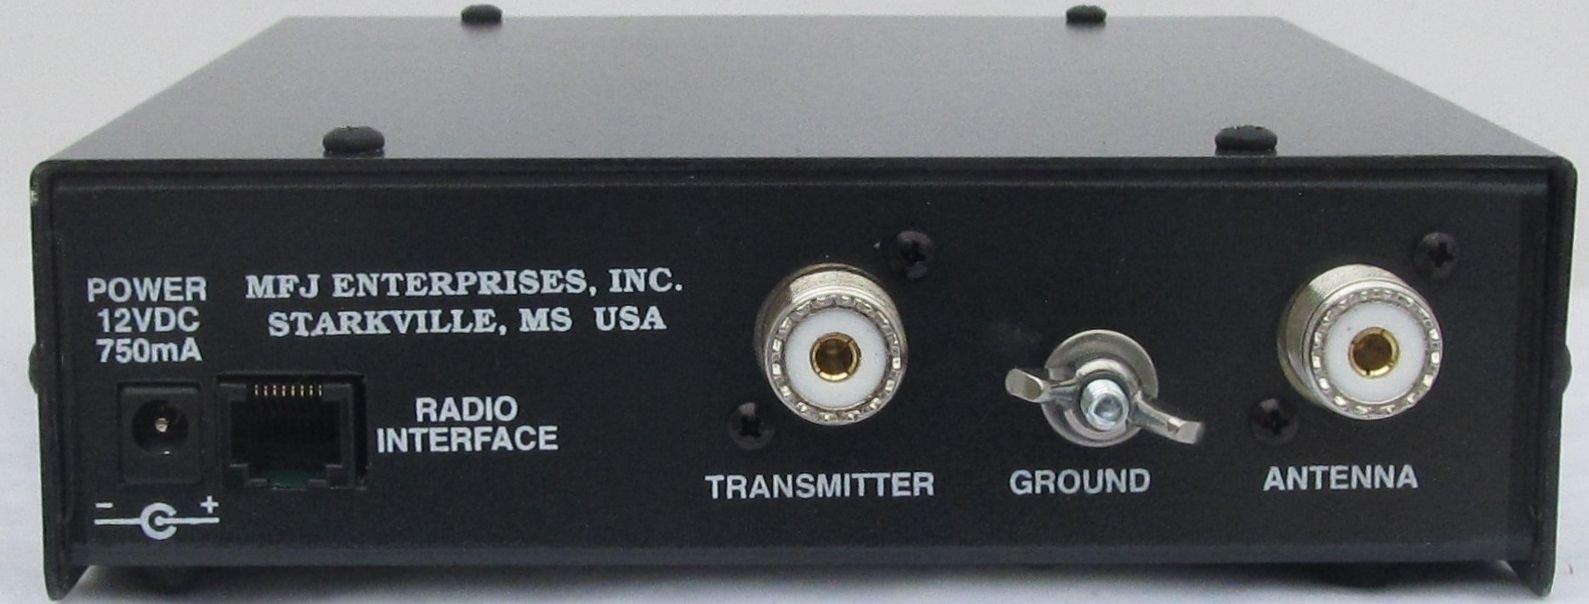 MFJ-939Y3 Plug & Play 200W 1.8-30MHz HF Autotuner for Select Yaesu HAM Radios